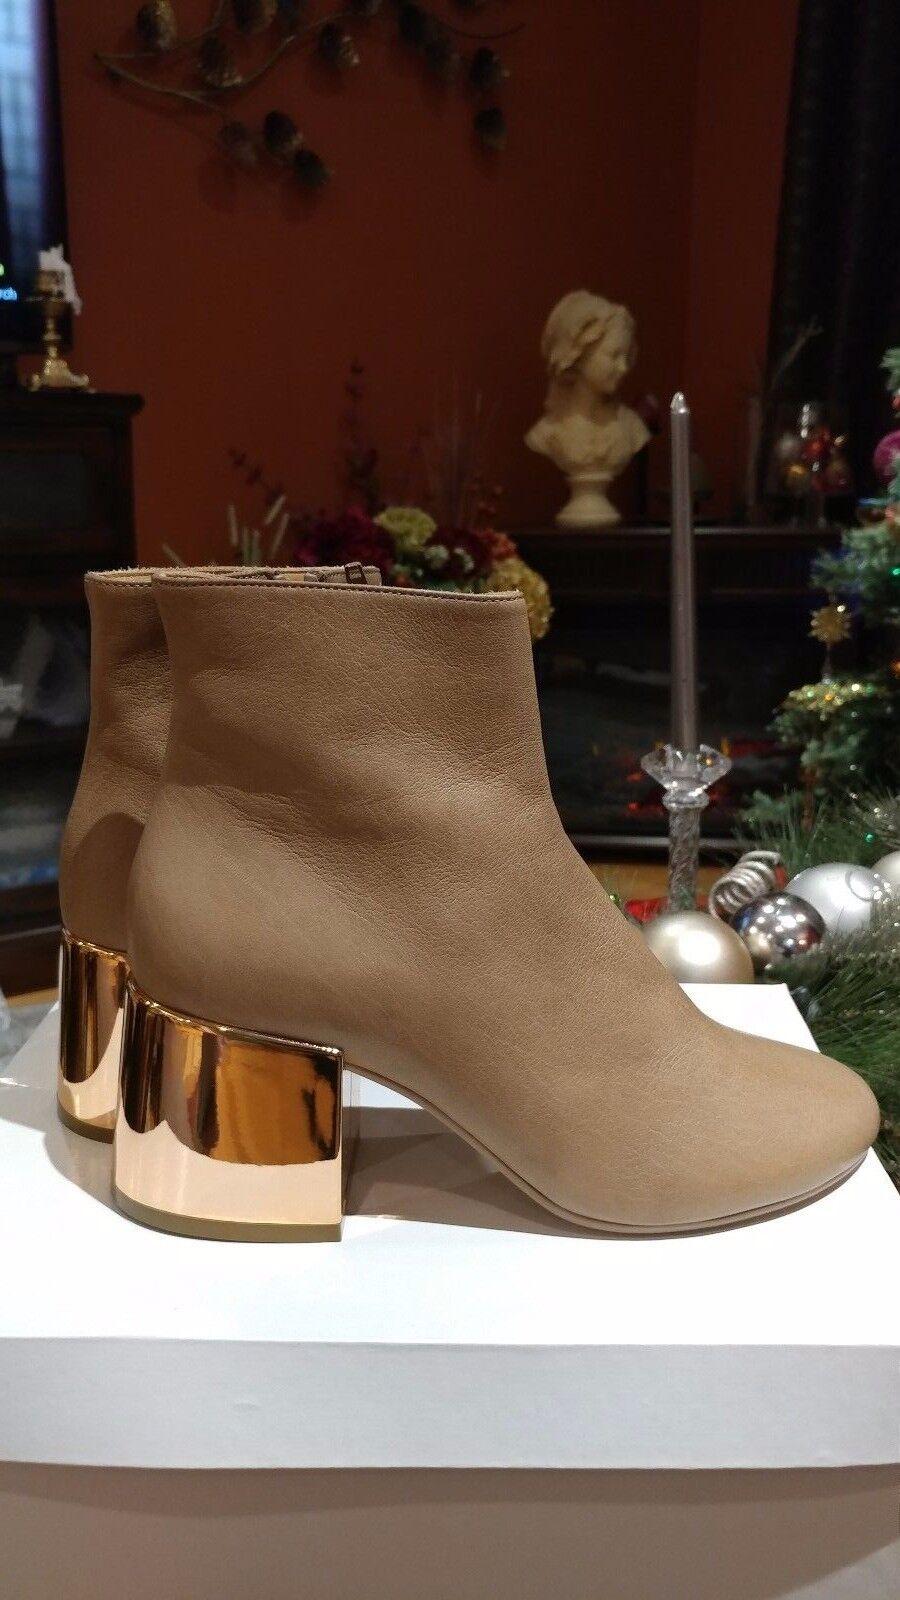 Maison Margiela leather new camel color booties size 38